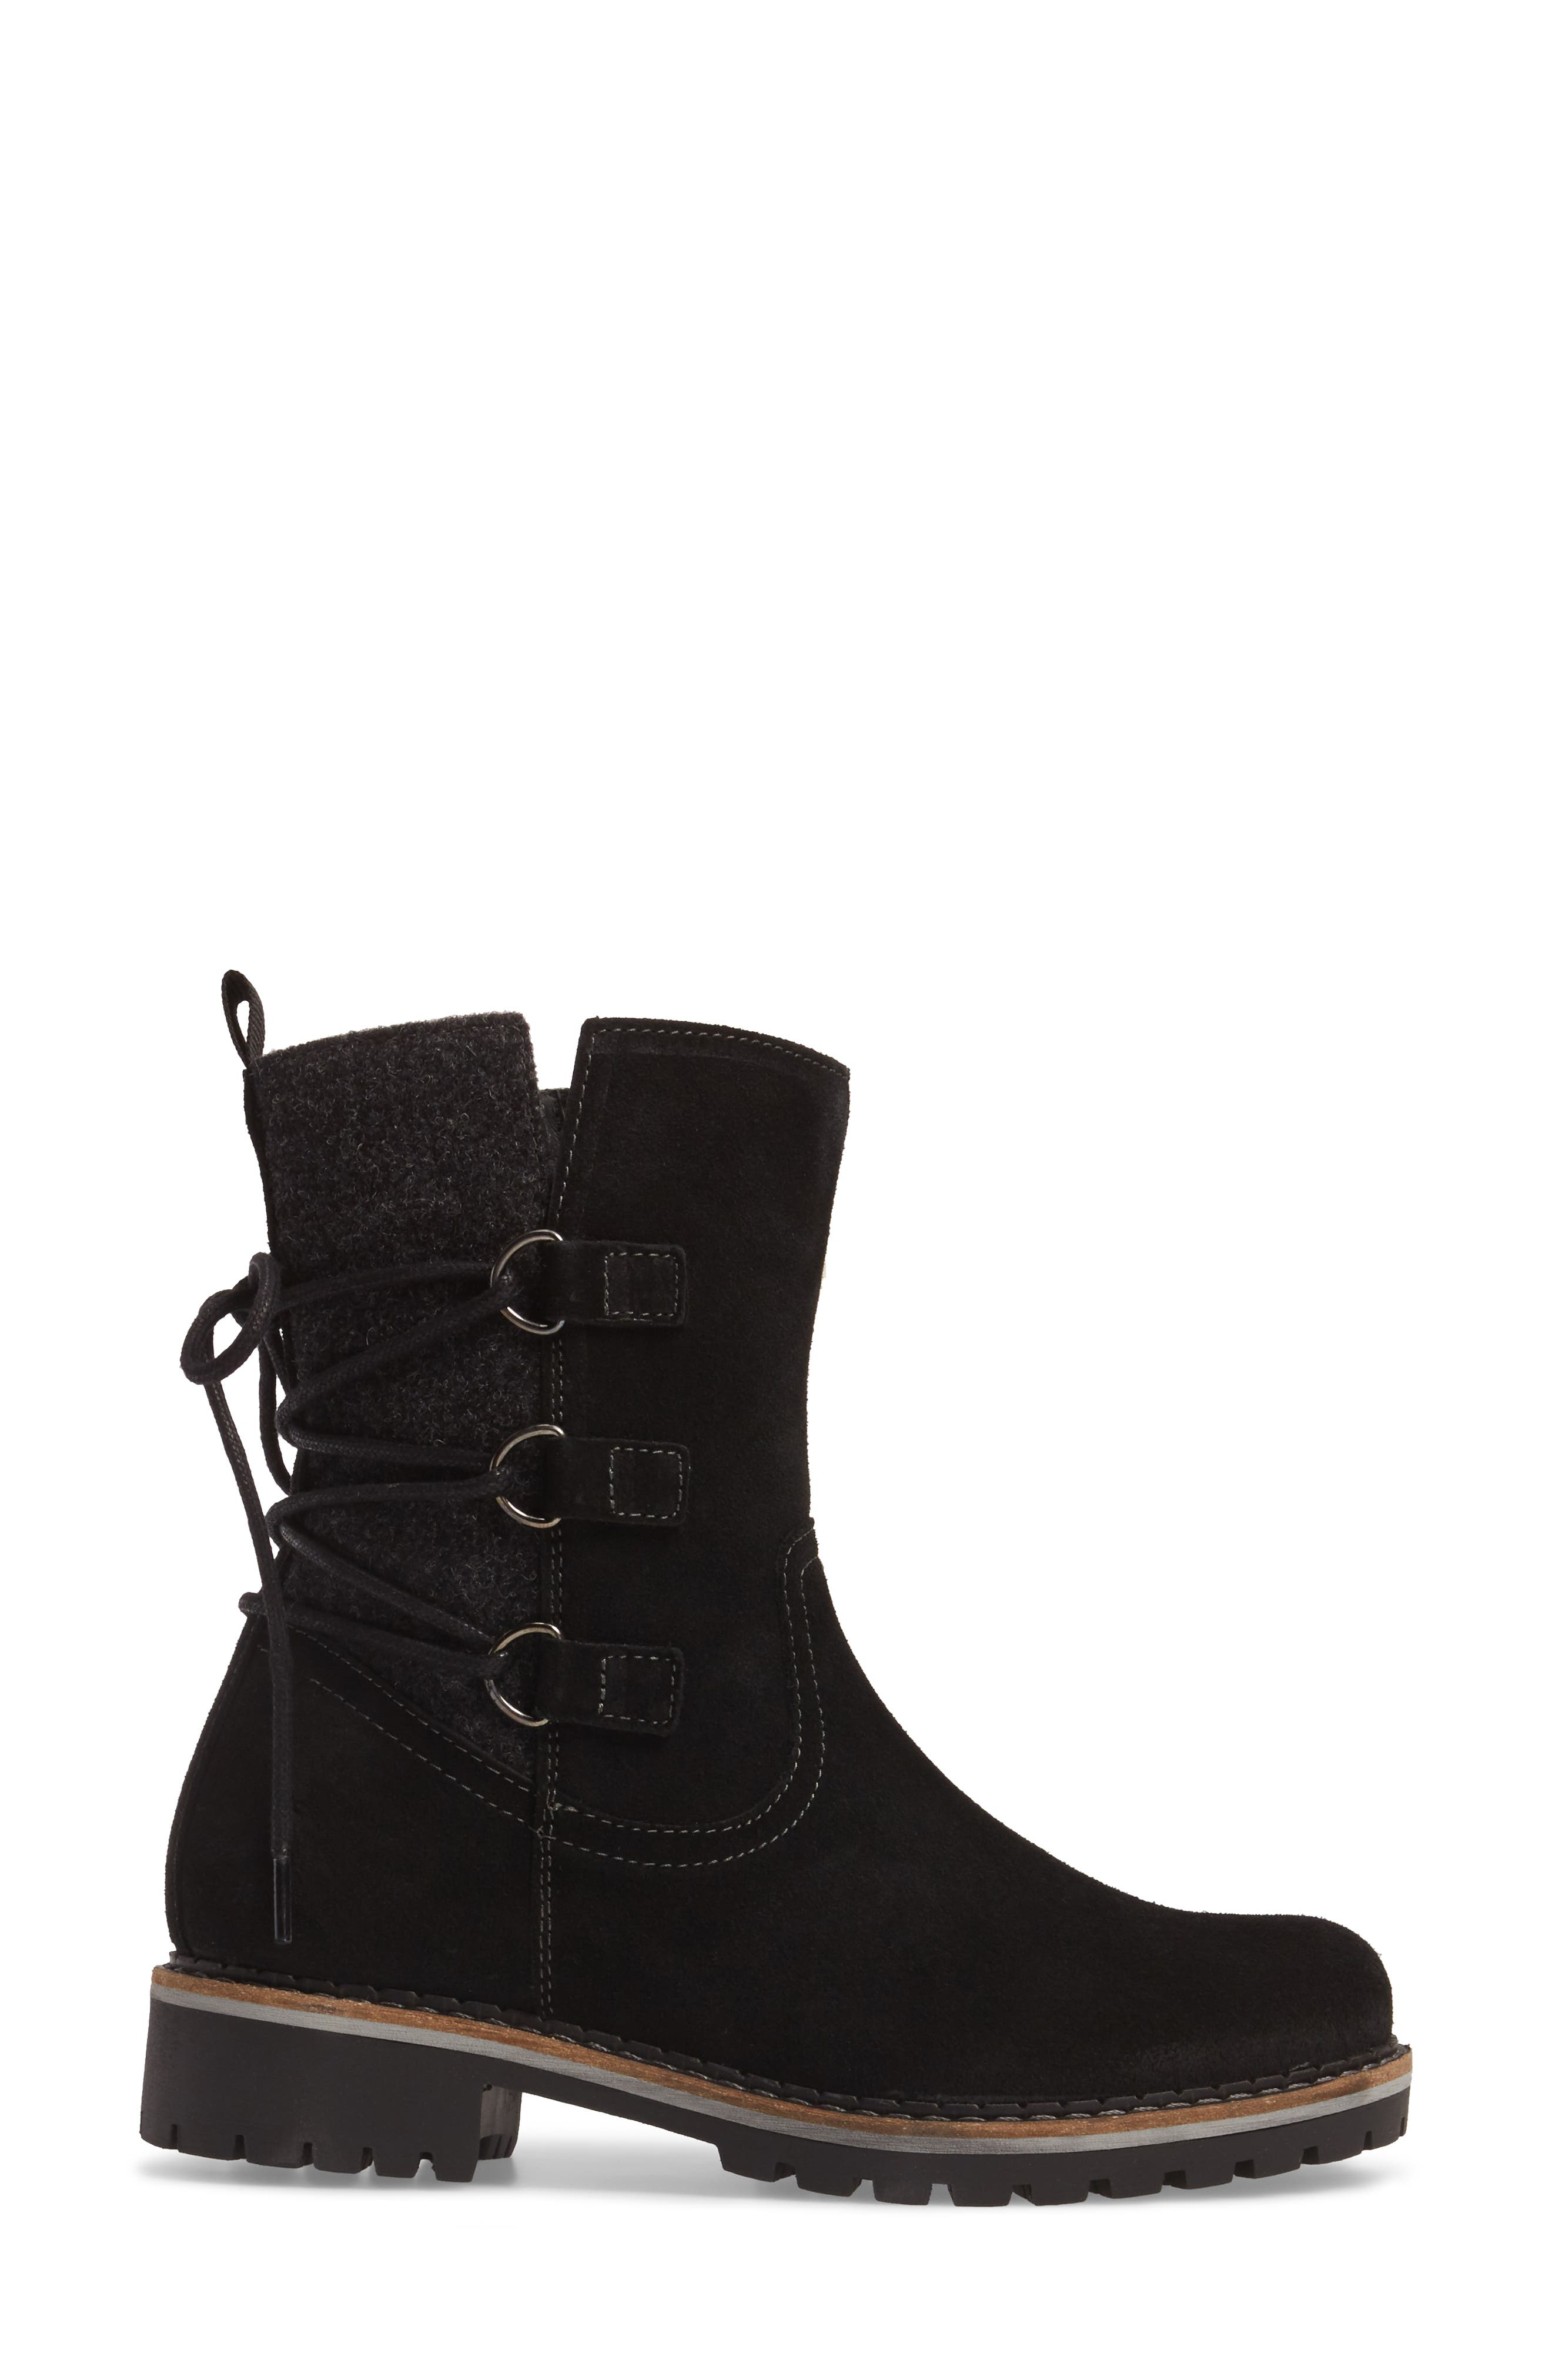 Cascade Waterproof Boot,                             Alternate thumbnail 3, color,                             Black/ Grey Suede